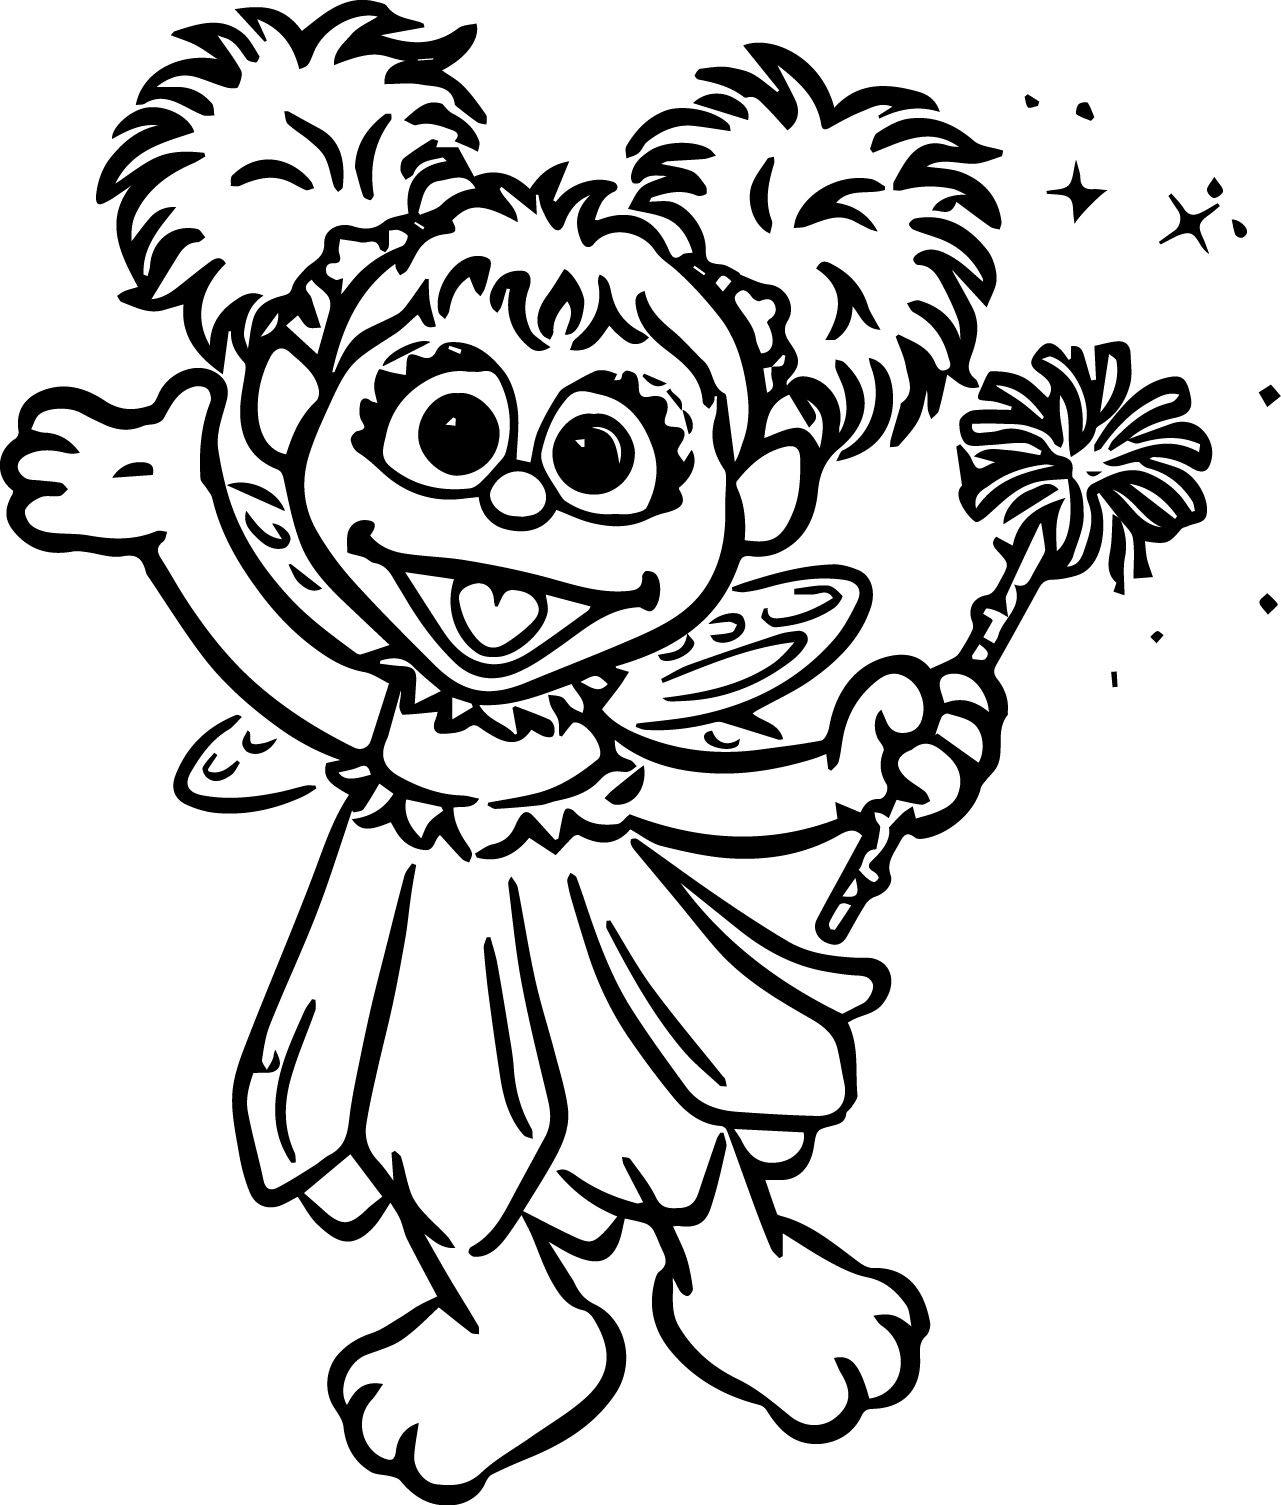 Tattly Sesame Street Characters Abby Cadabby Grande